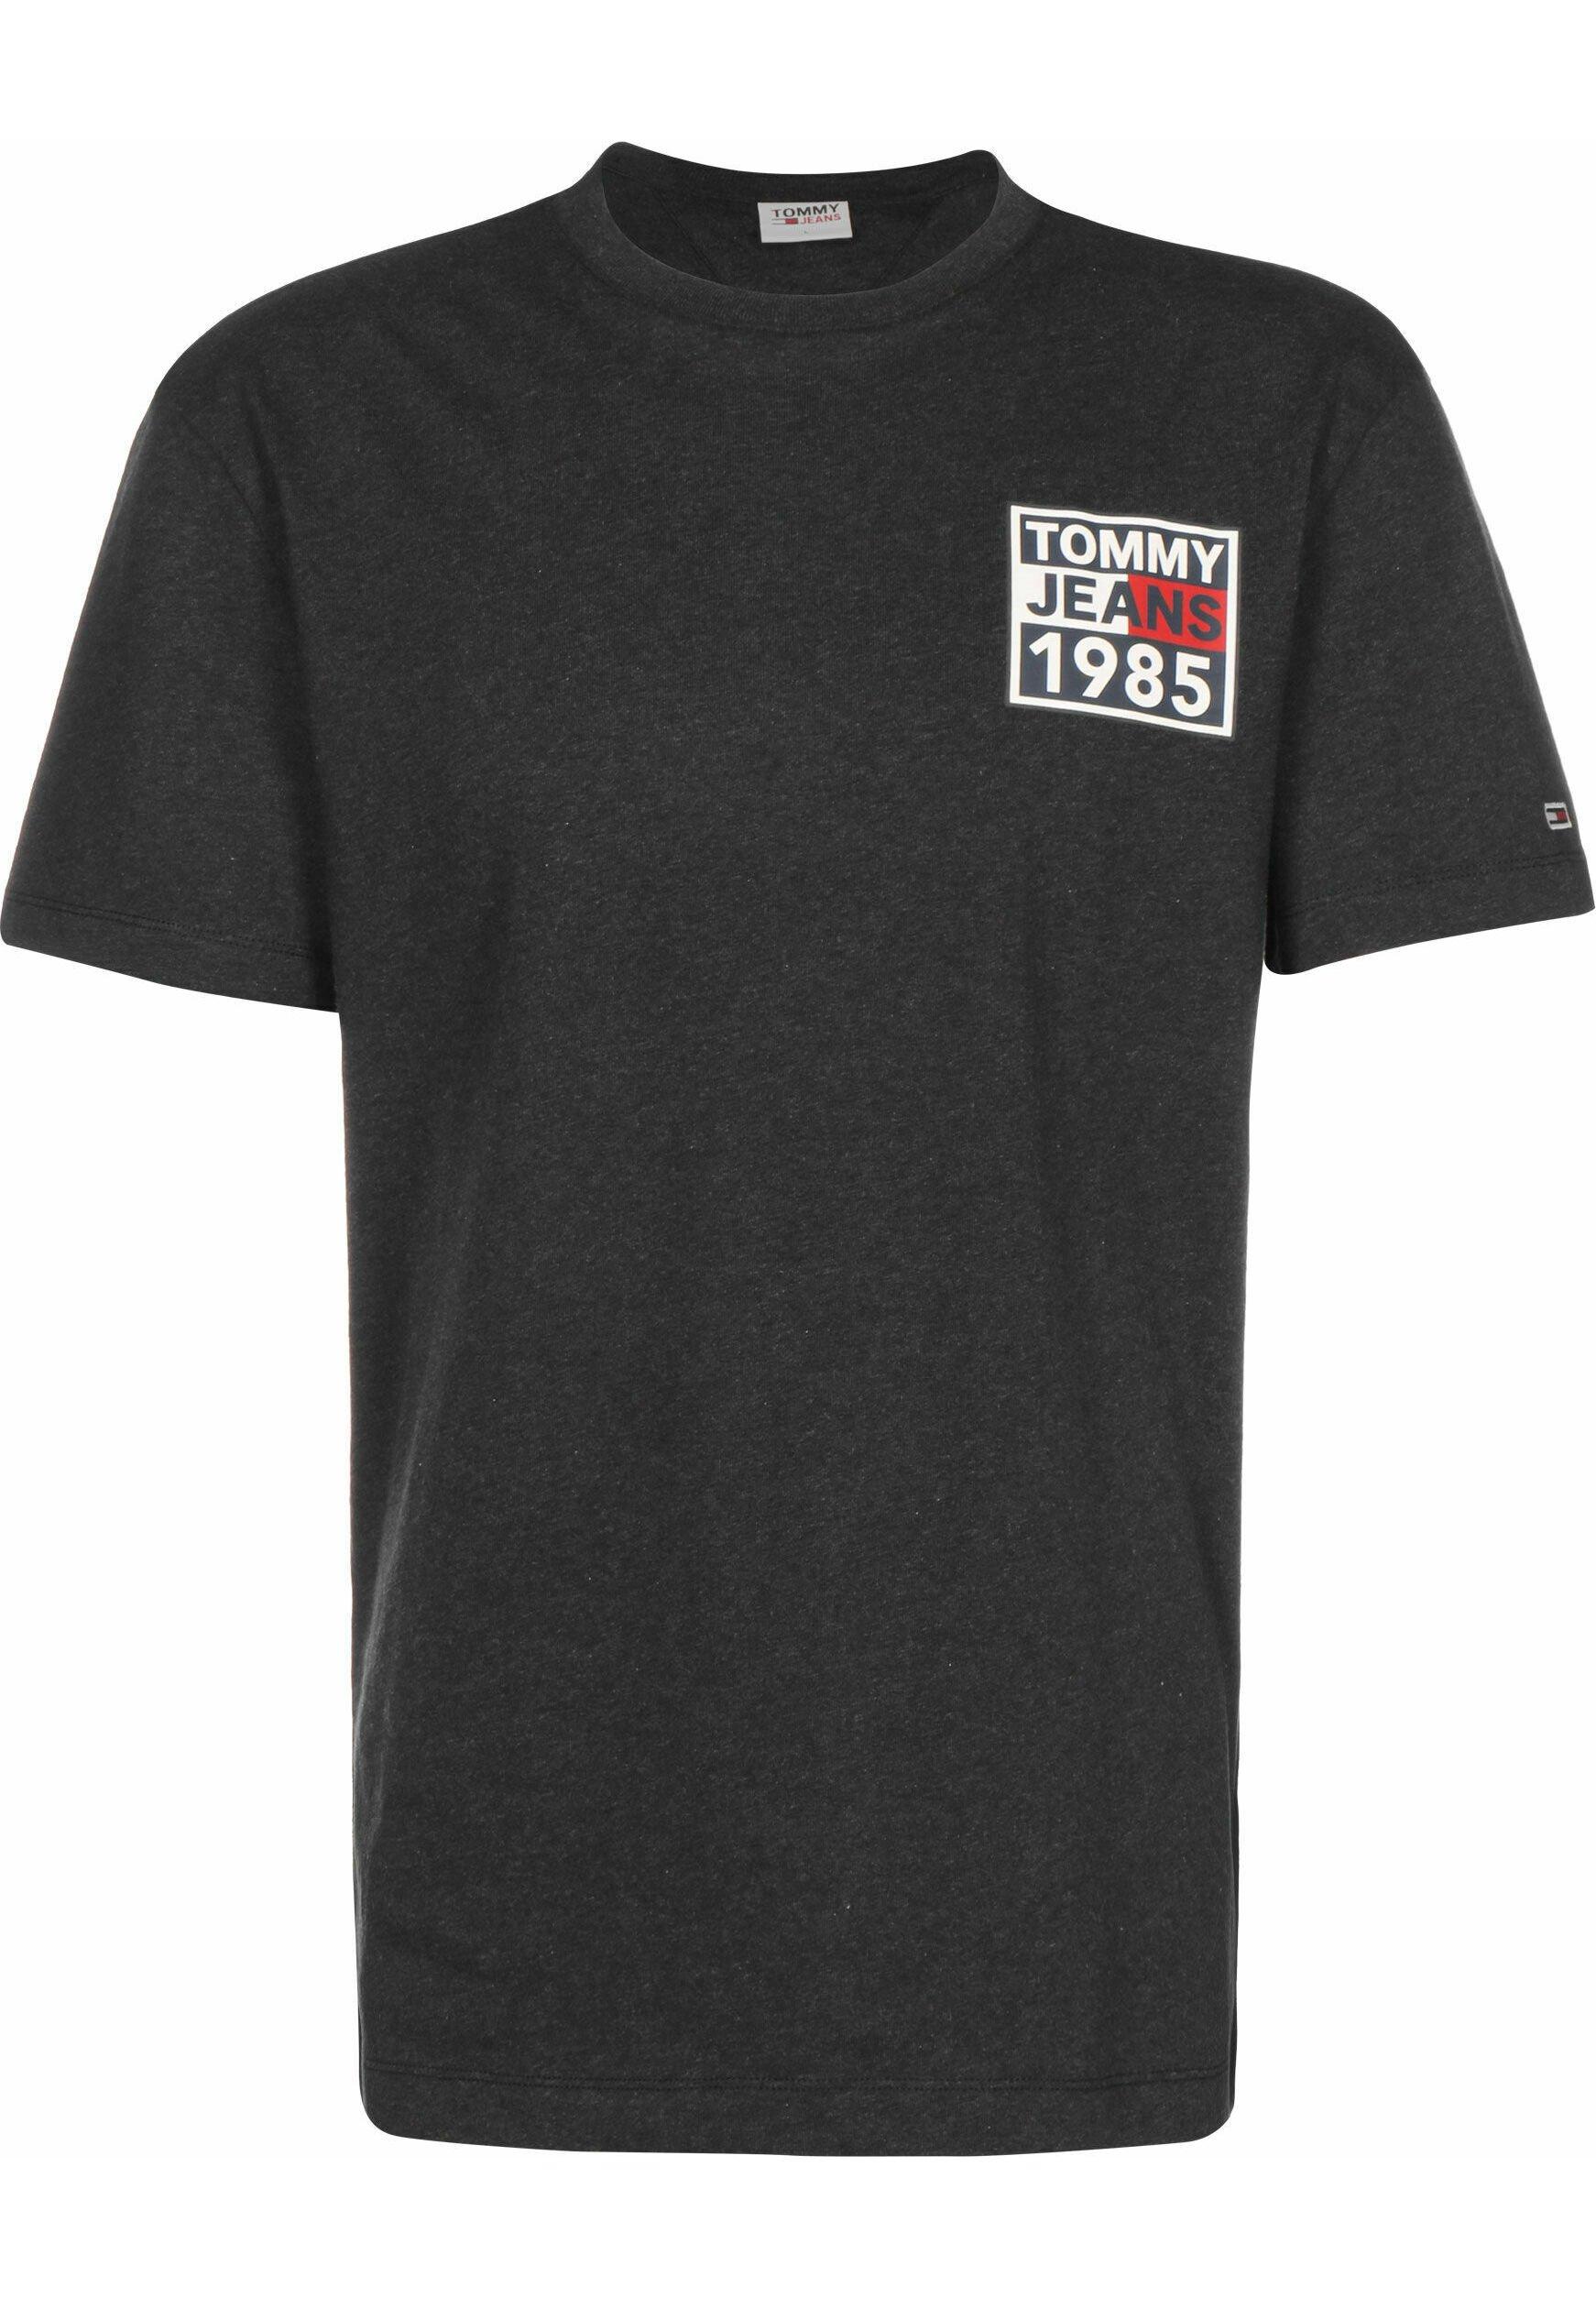 1781846-Lxz15.jpg